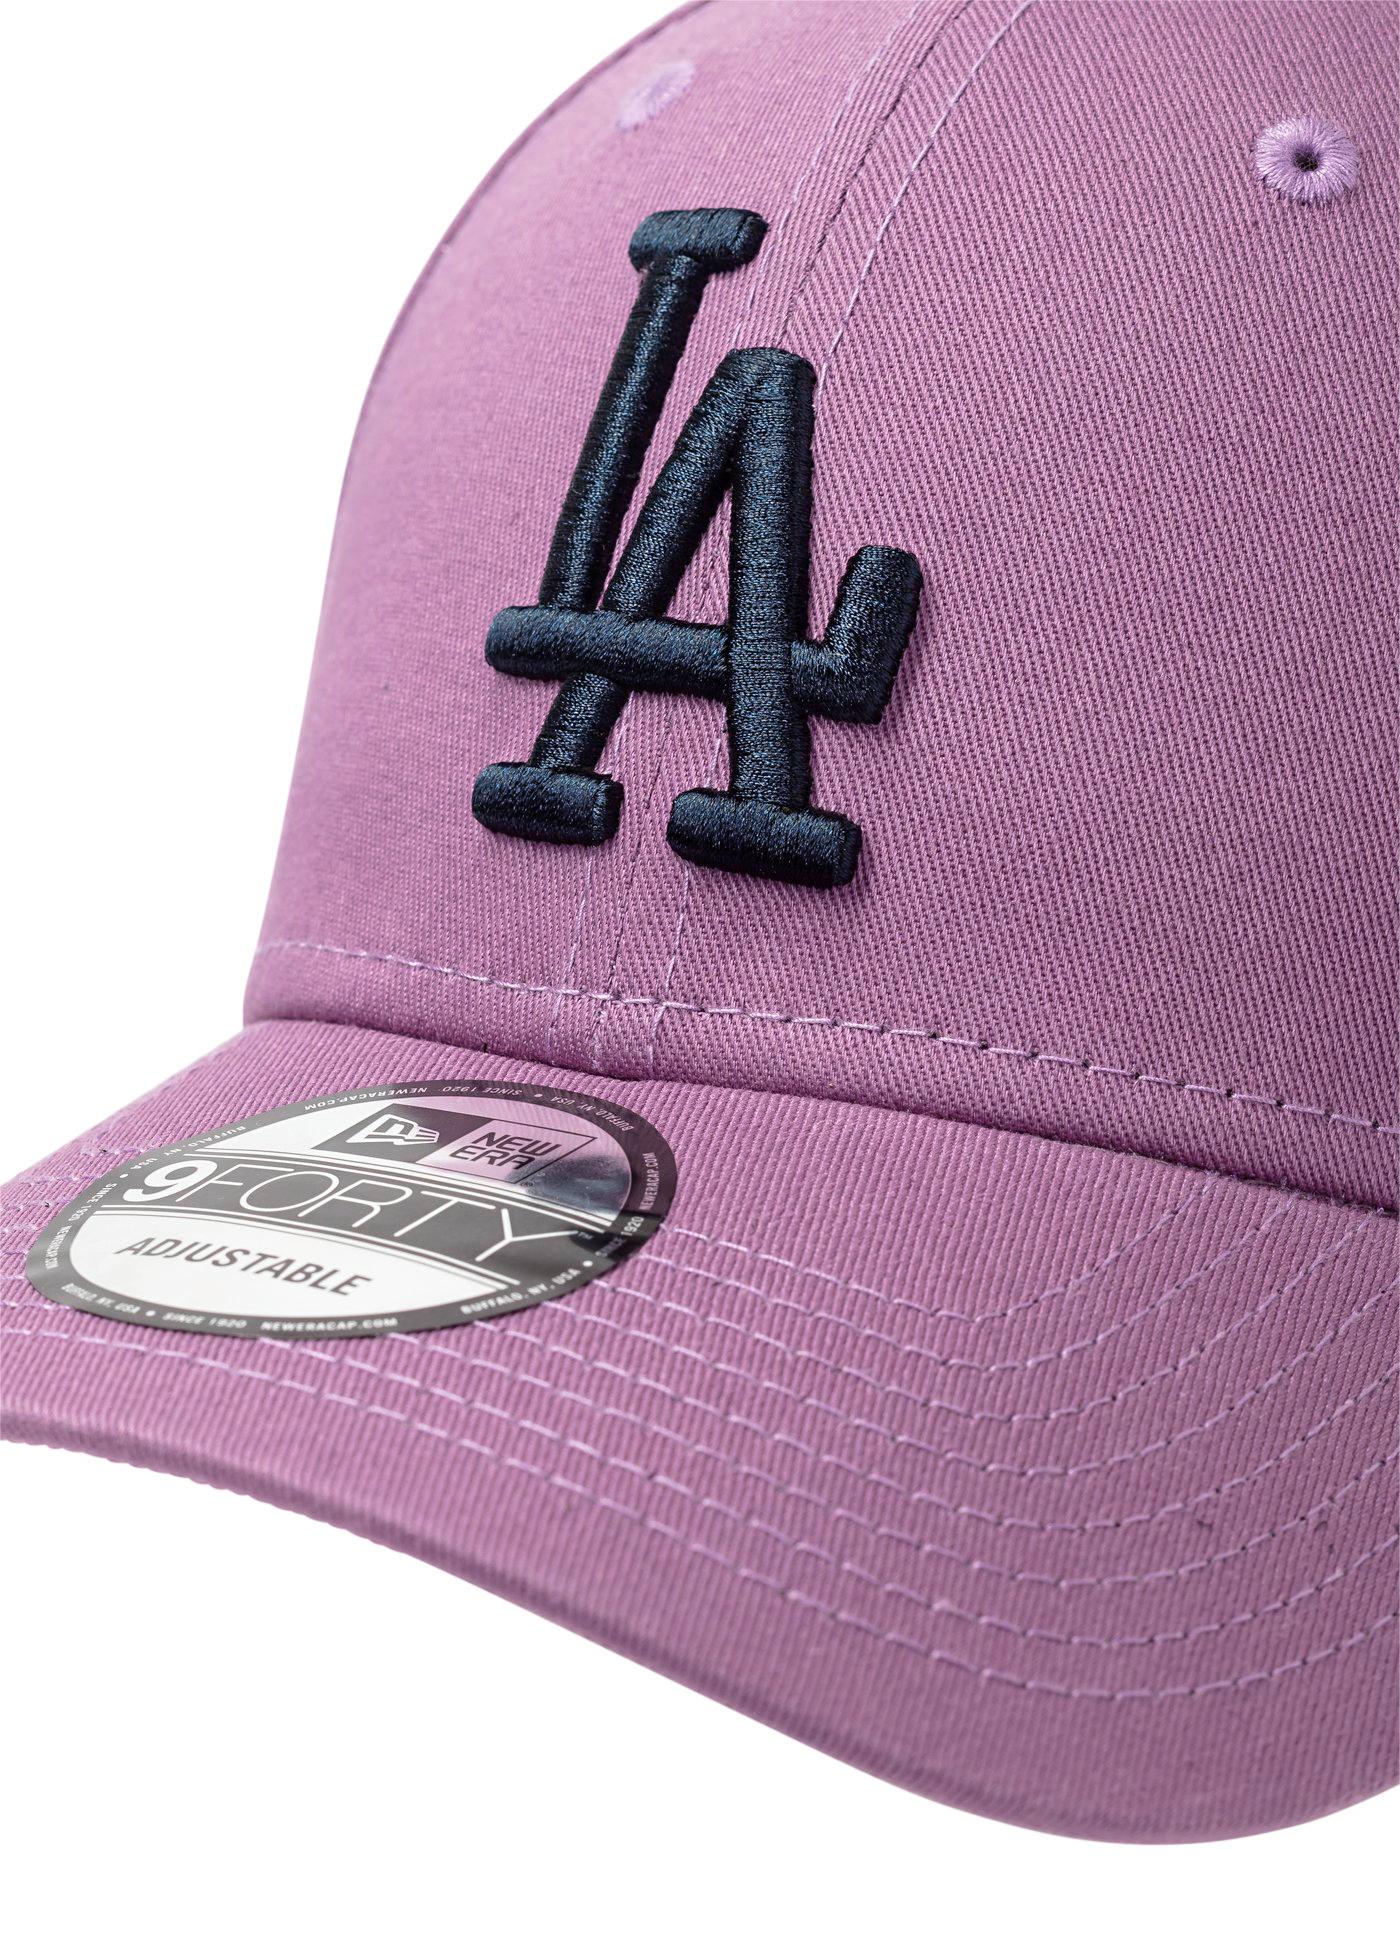 940 MLB PROPERTIES LOS ANGELES DODGERS image number 1